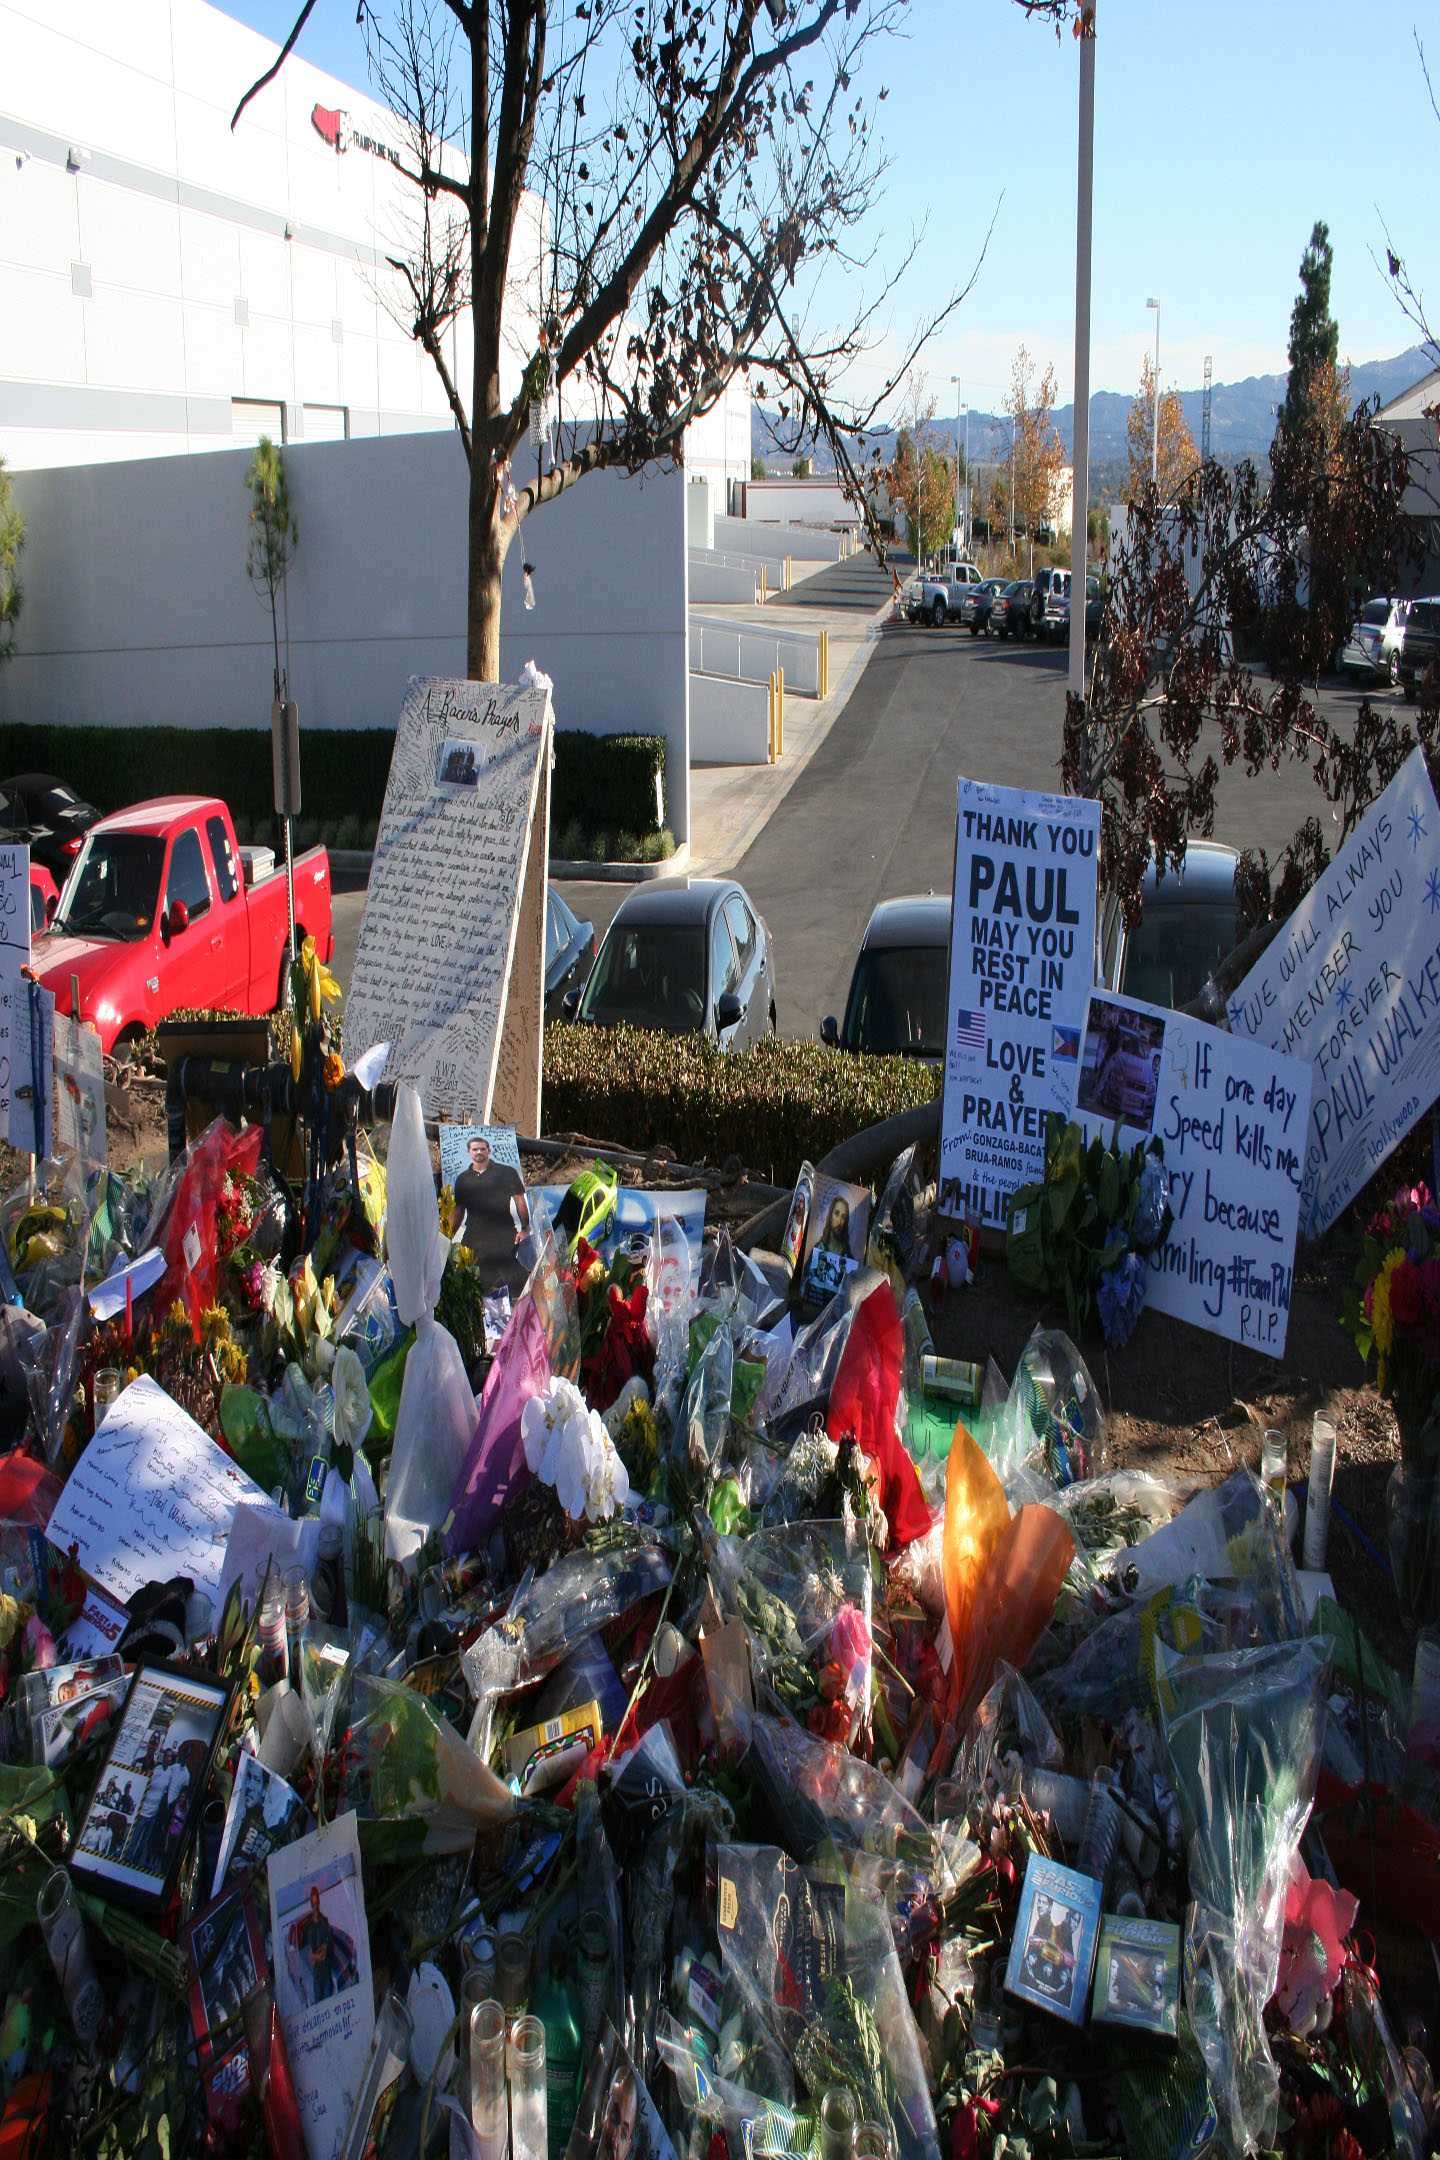 ... following Paul Walker's death? : Celebrities, News - India Today